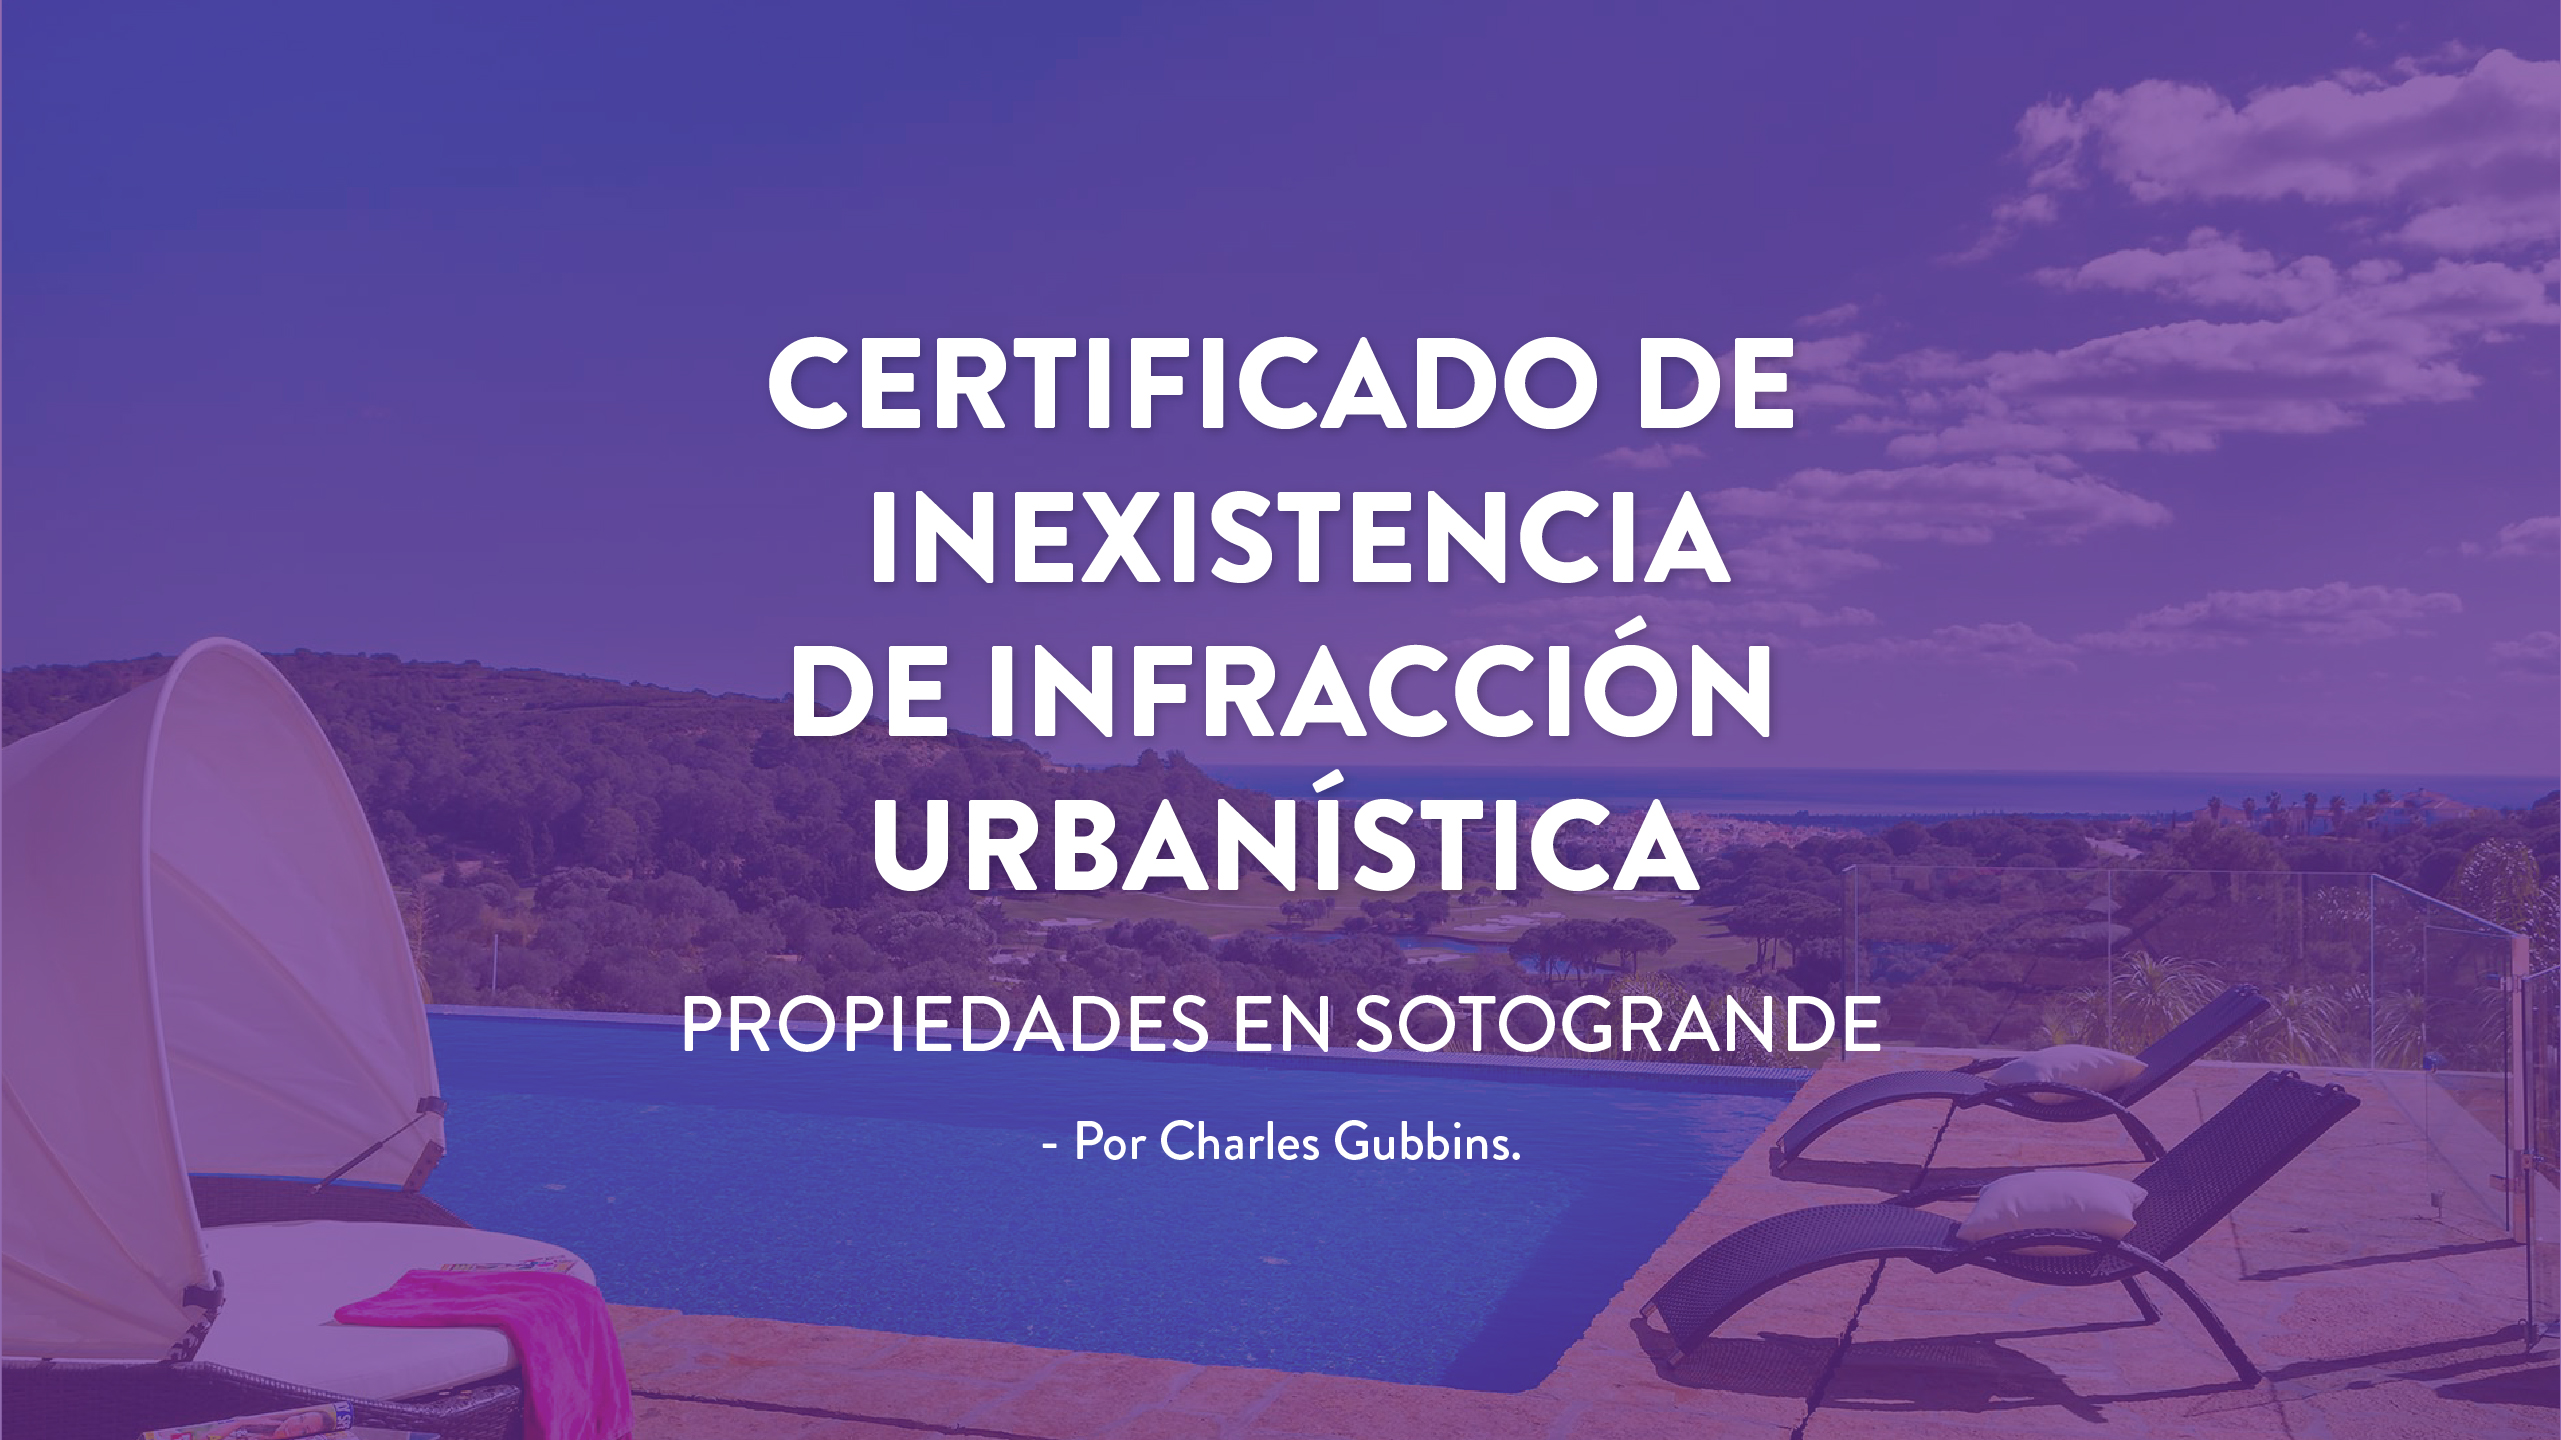 certificado-no-infraccion-urbanistica-noll-sotogrande-inmobiliaria-blog-2020-1